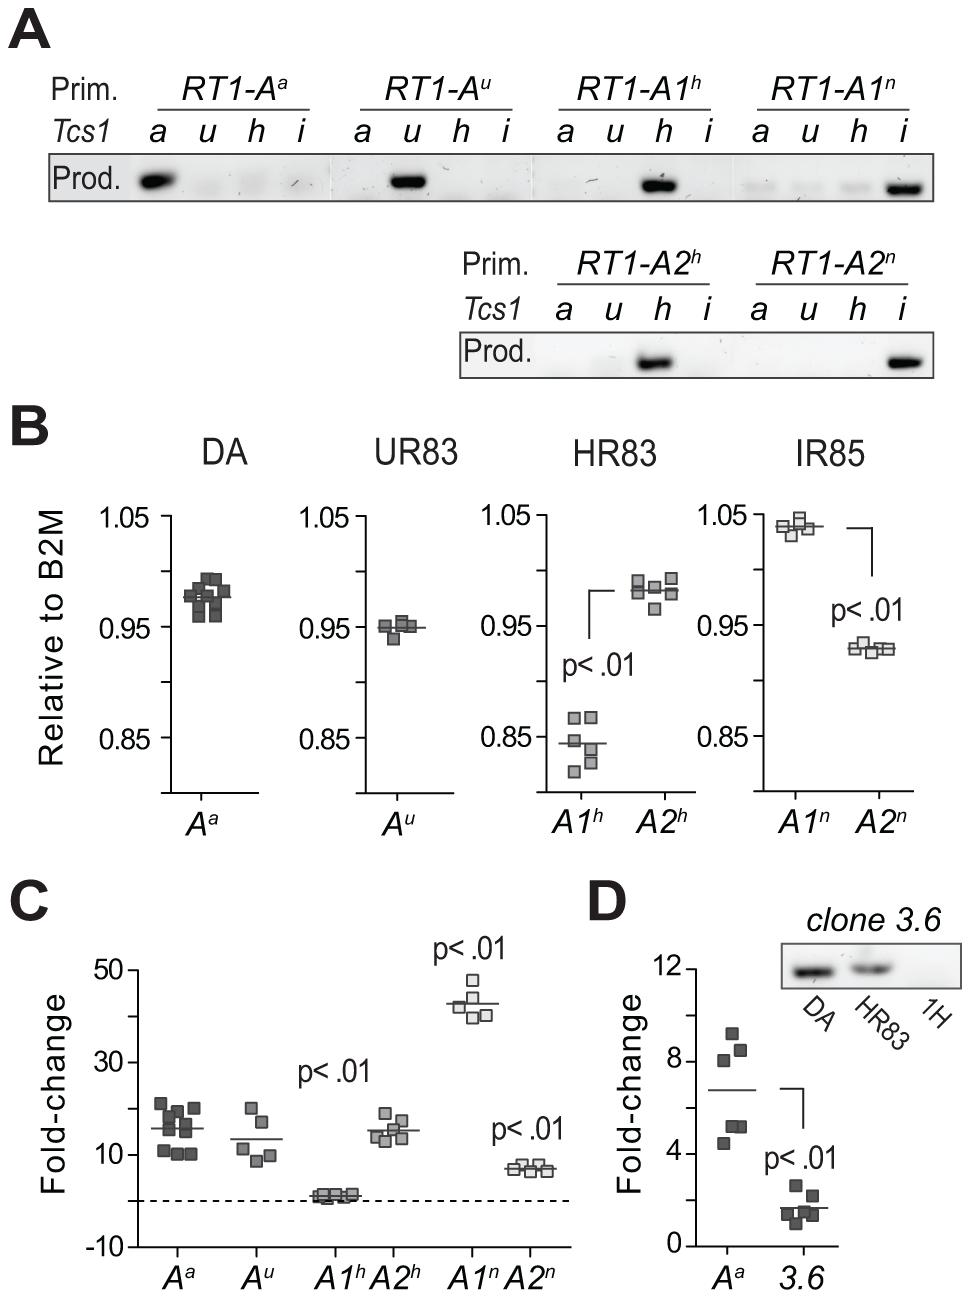 Transcriptional regulation of MHC class I genes.